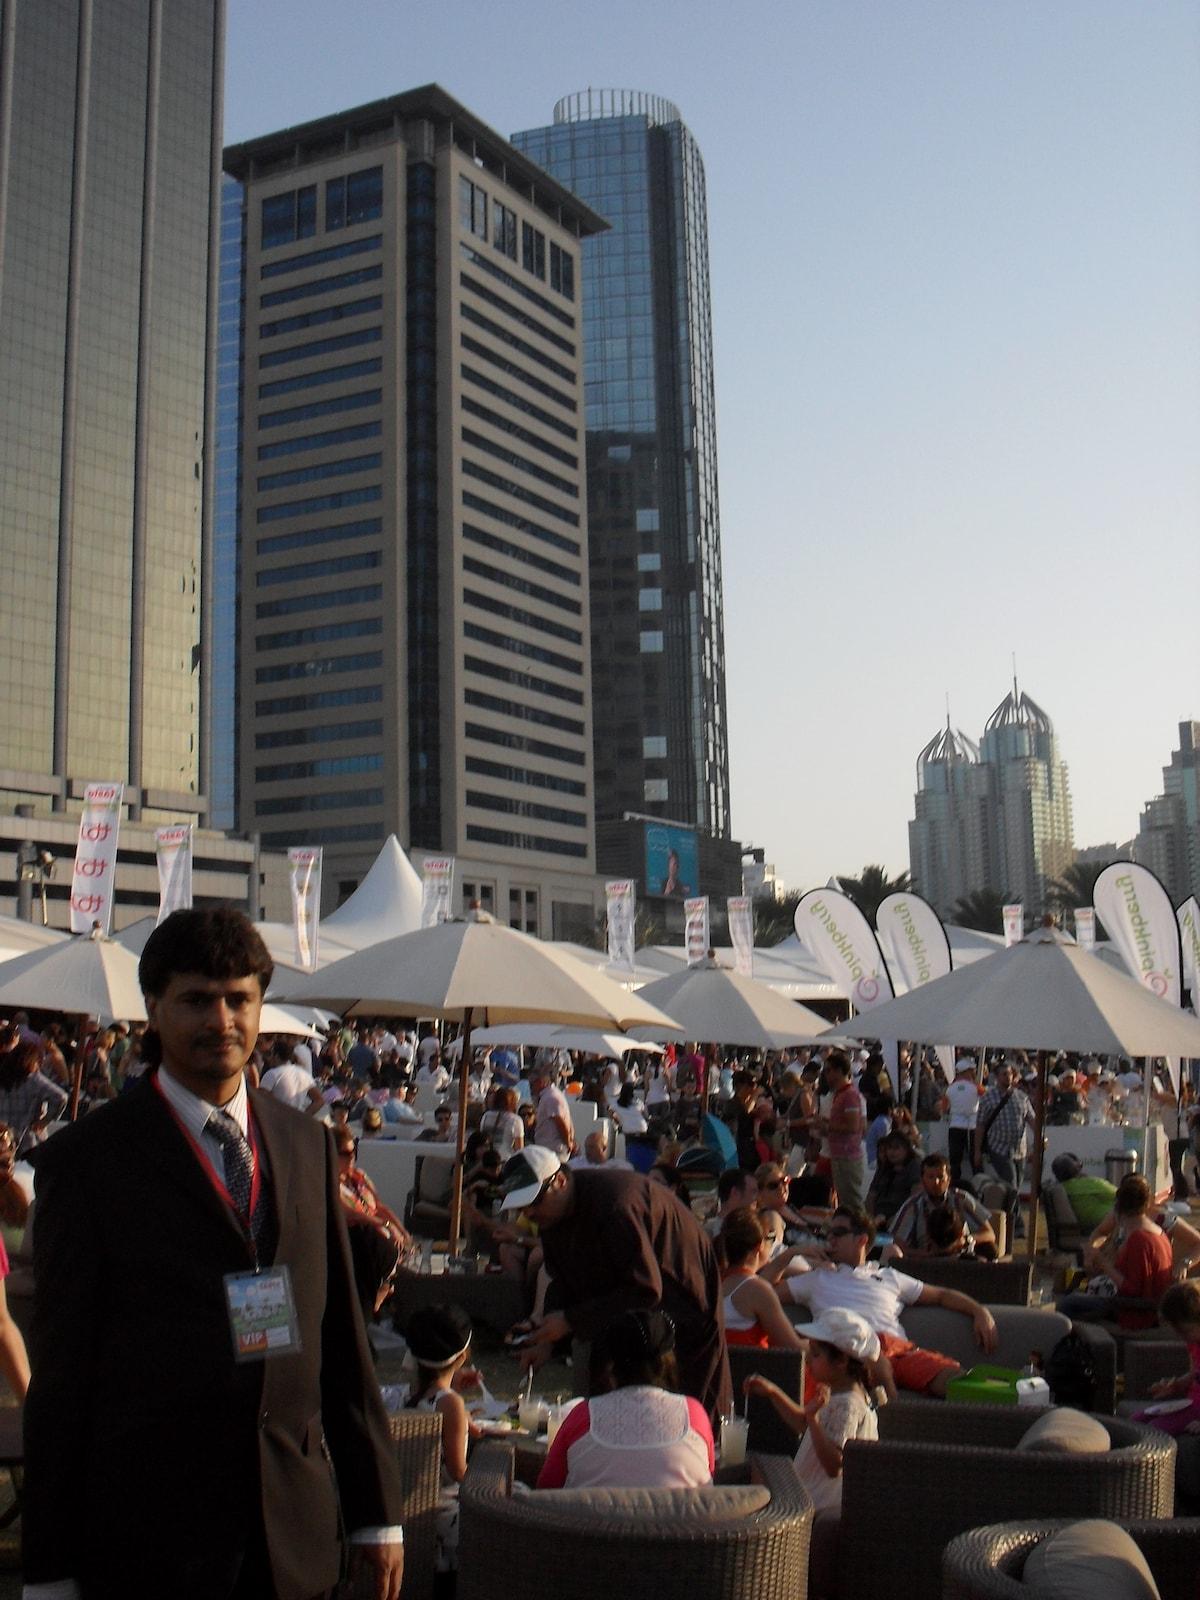 Manoj From Sharjah, United Arab Emirates